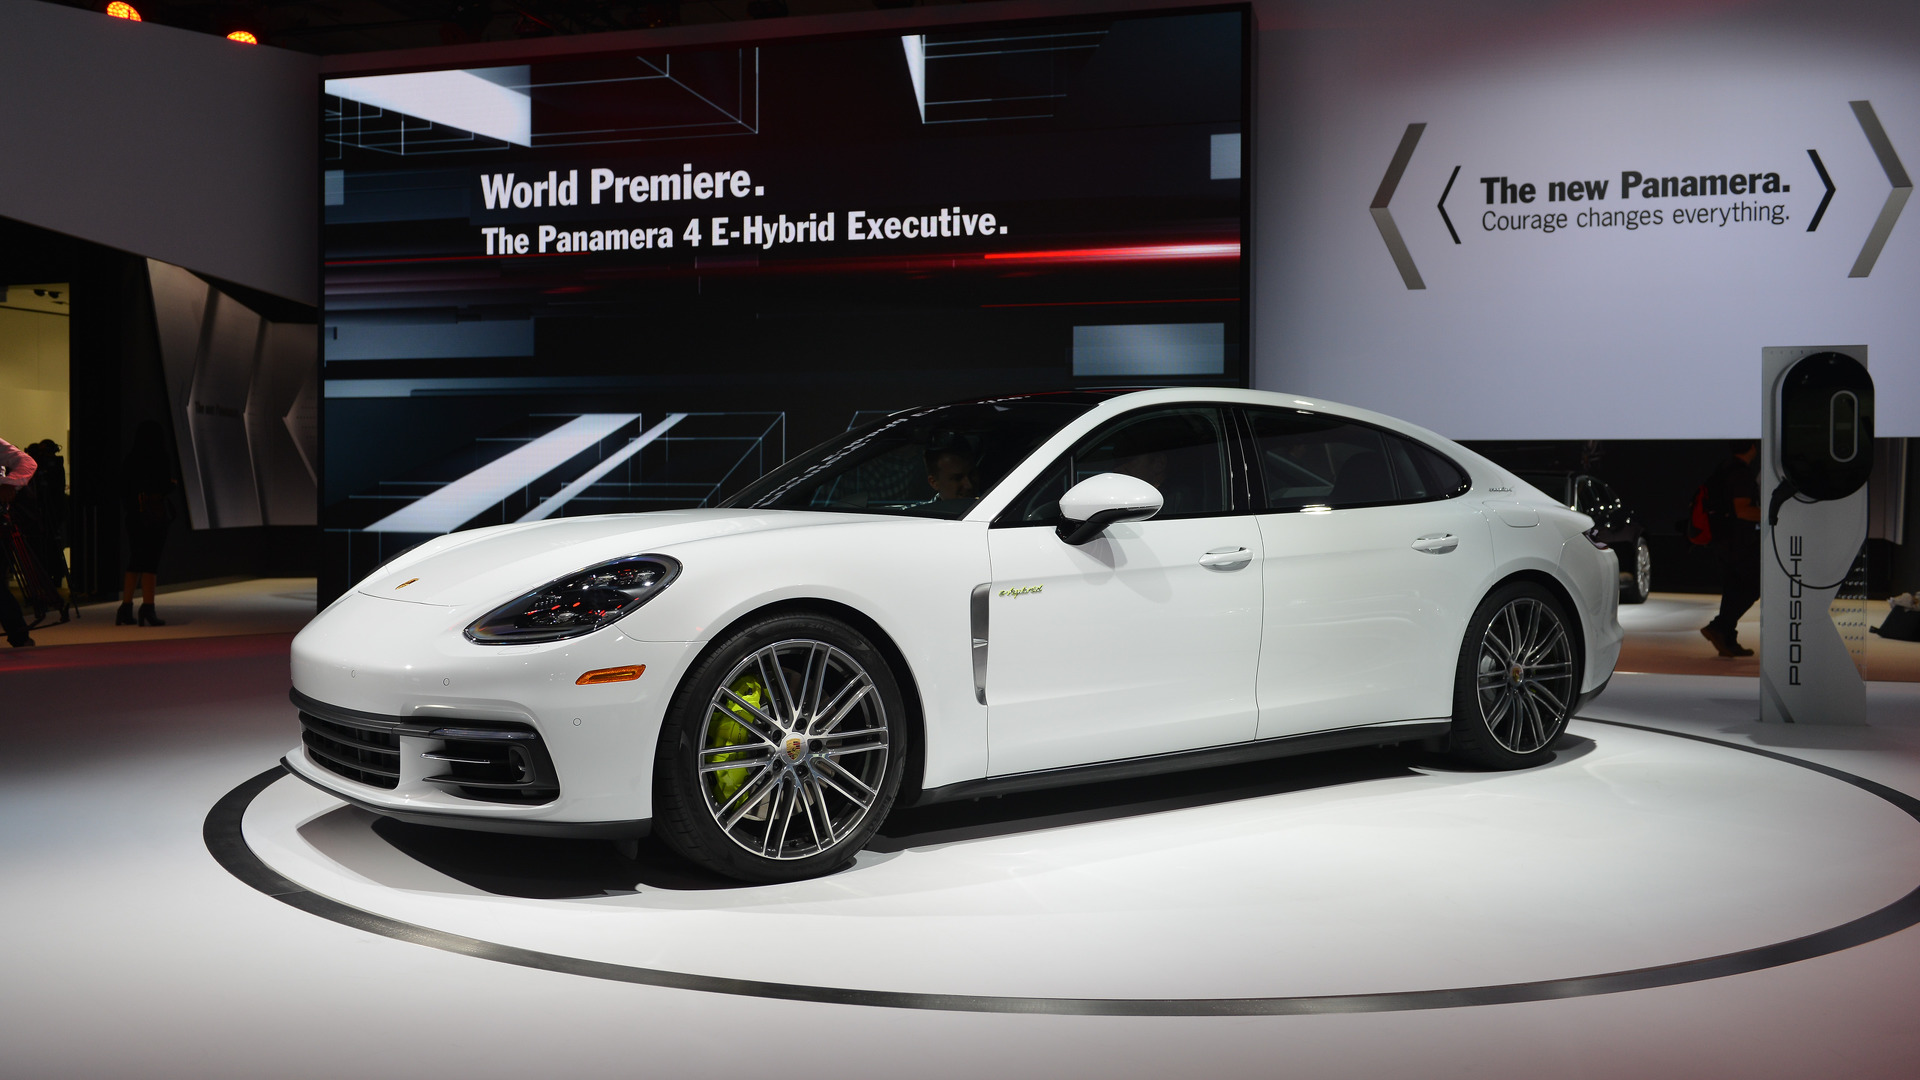 Porsche Panamera 4 E Hybrid Executive Lwb Wants To Do It All